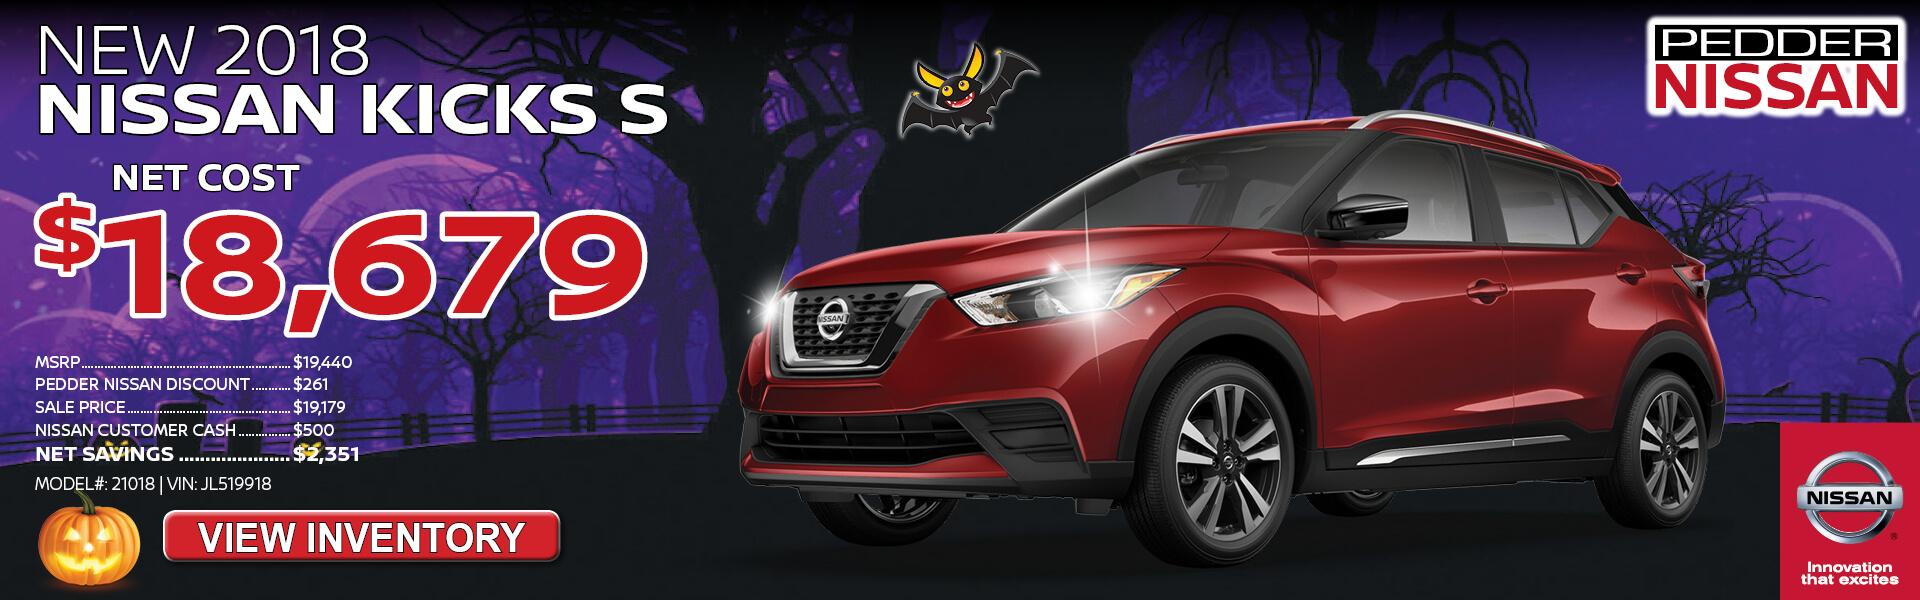 Nissan Kicks $18,679 Purchase